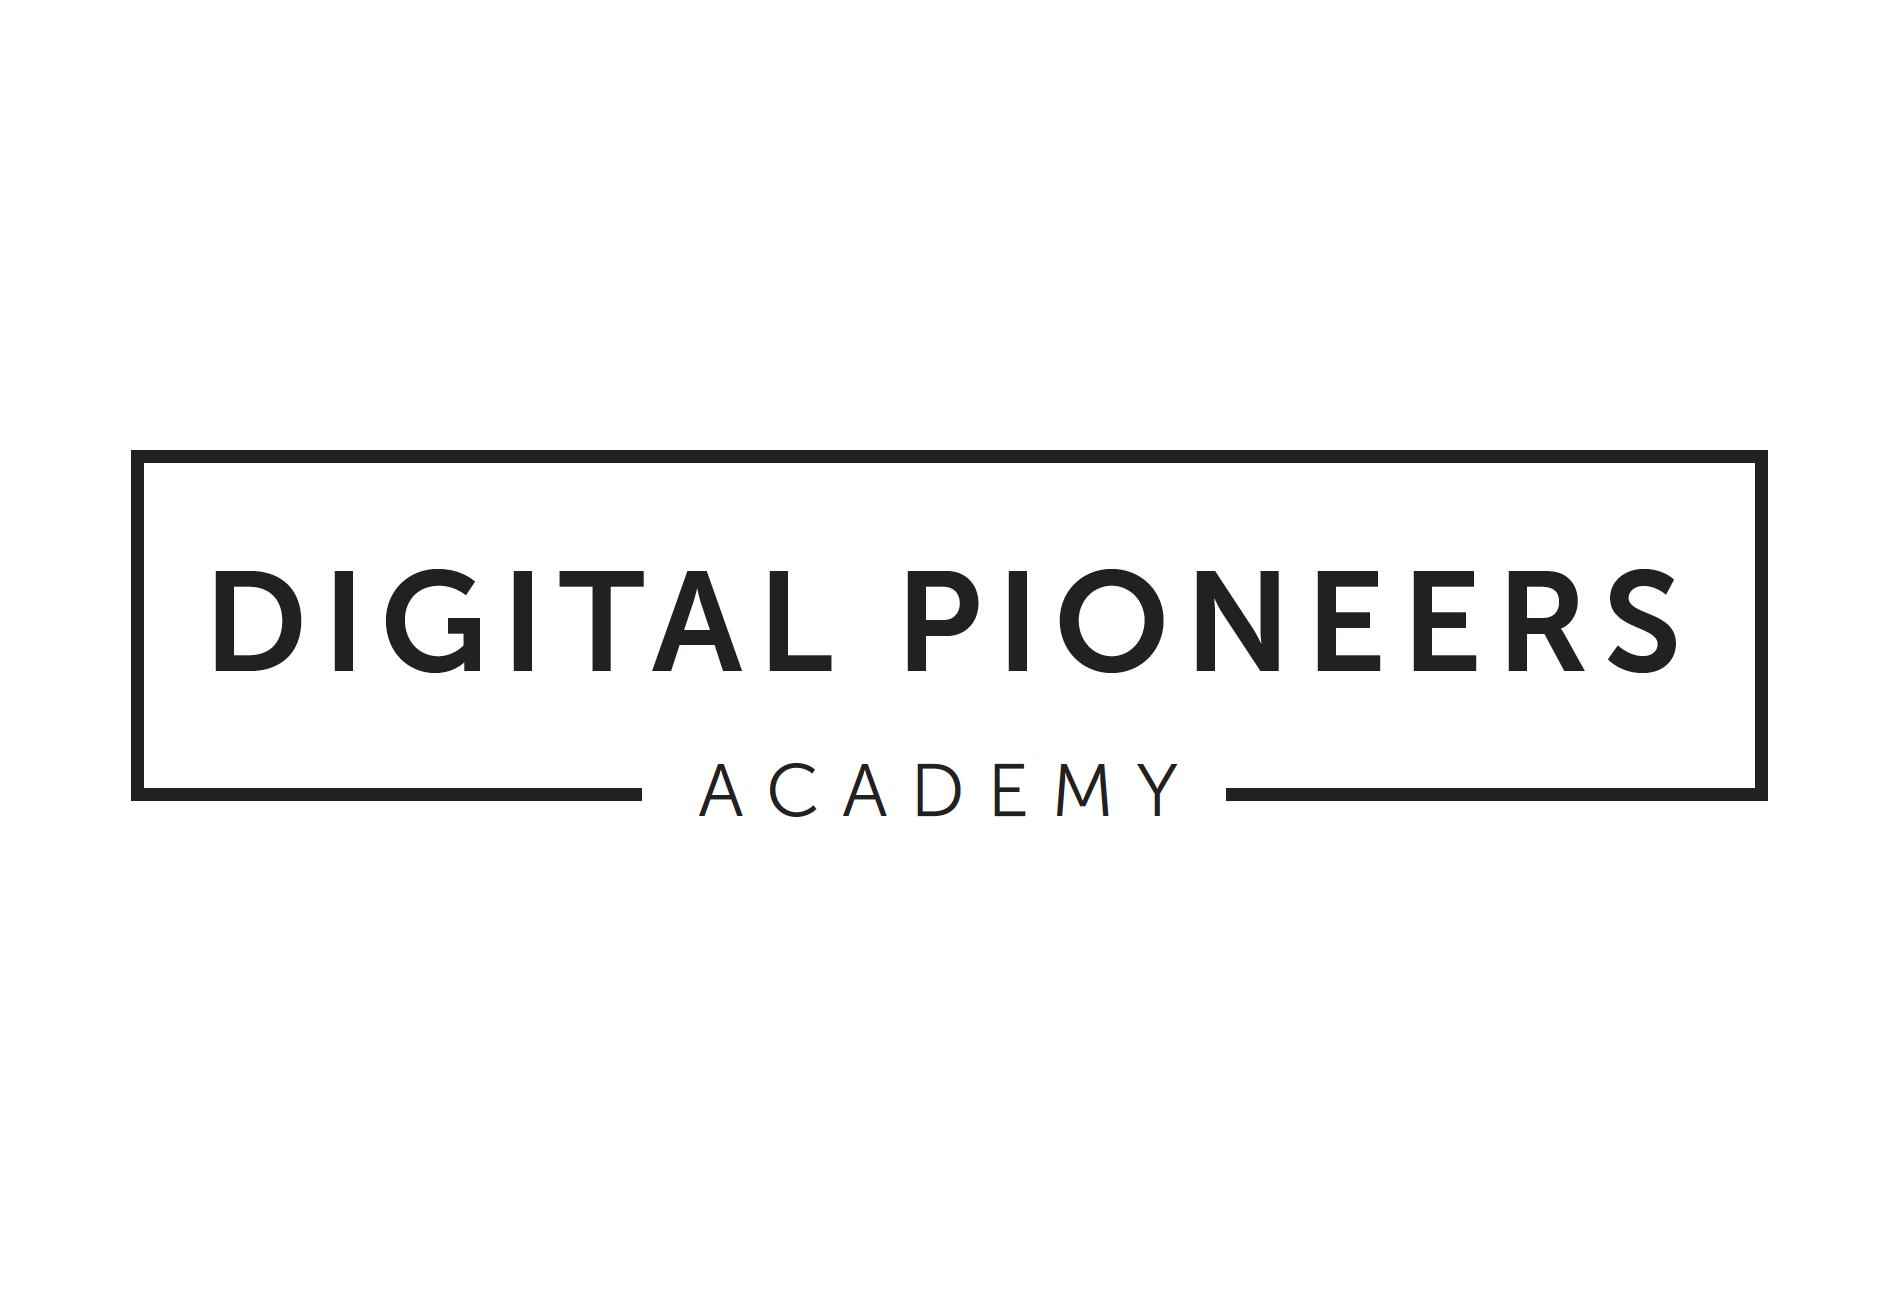 Digital Pioneers Academy PCS